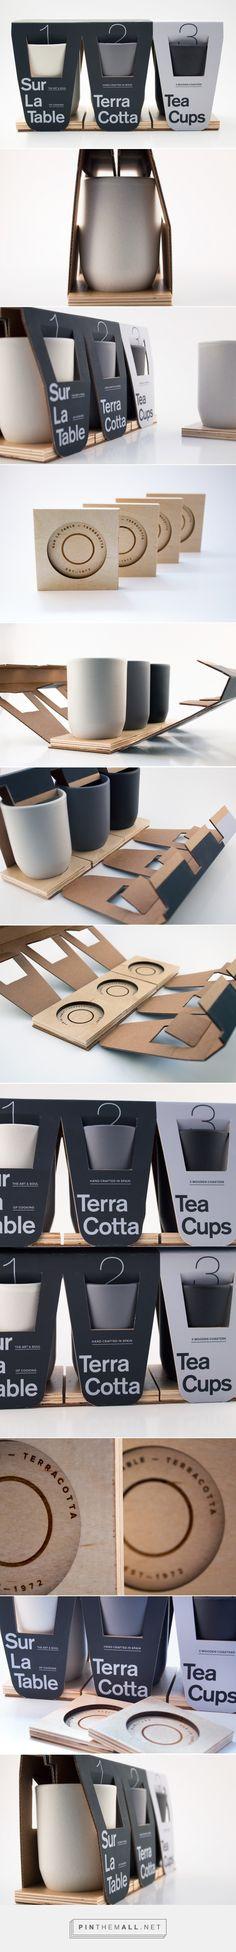 Sur La Table Terracotta cup + coasters packaging design by Alireza Jajarmi (USA) - http://www.packagingoftheworld.com/2016/09/sur-la-table-terracotta.html